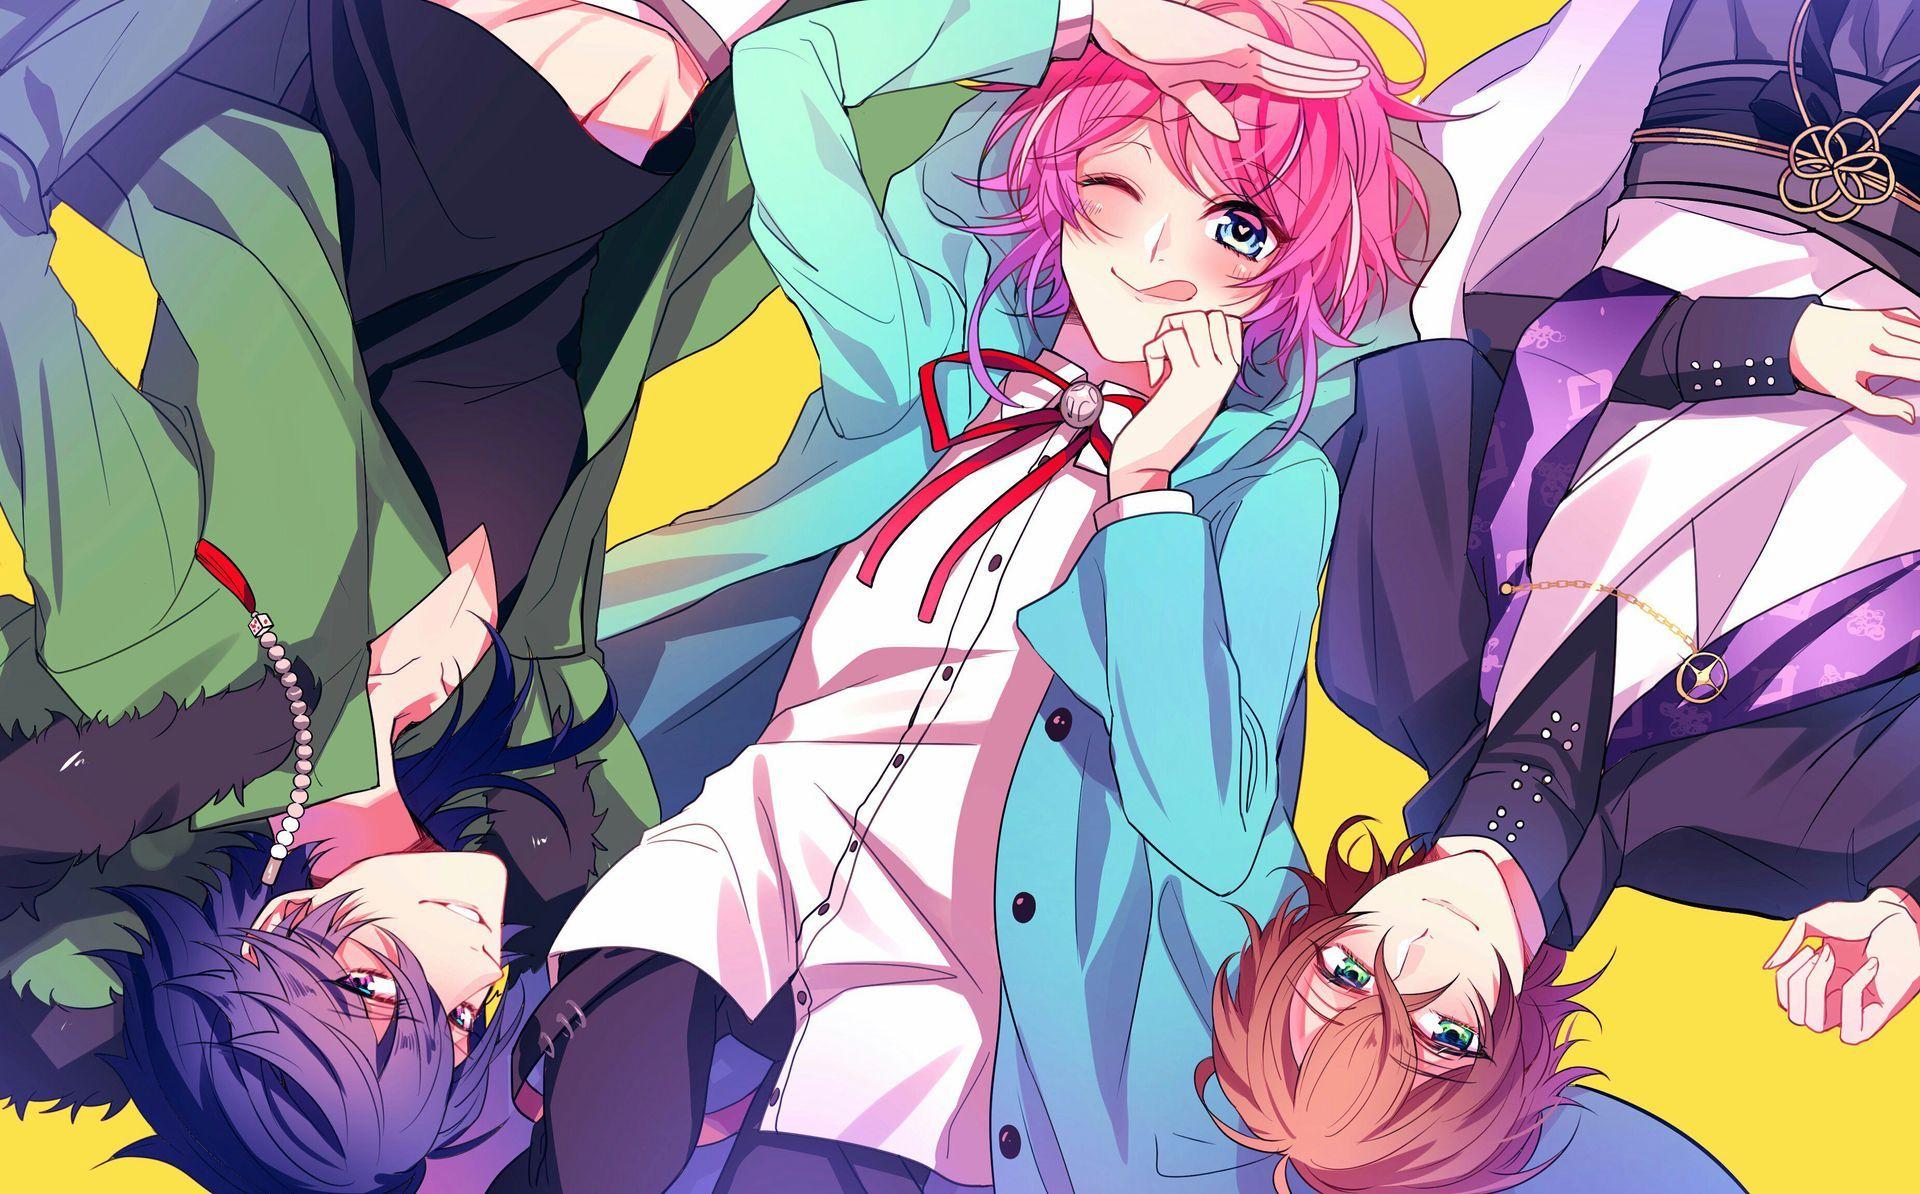 5 Anime Ini Haram Banget Kalo Ditonton Pas Bulan Puasa BAGIAN 1